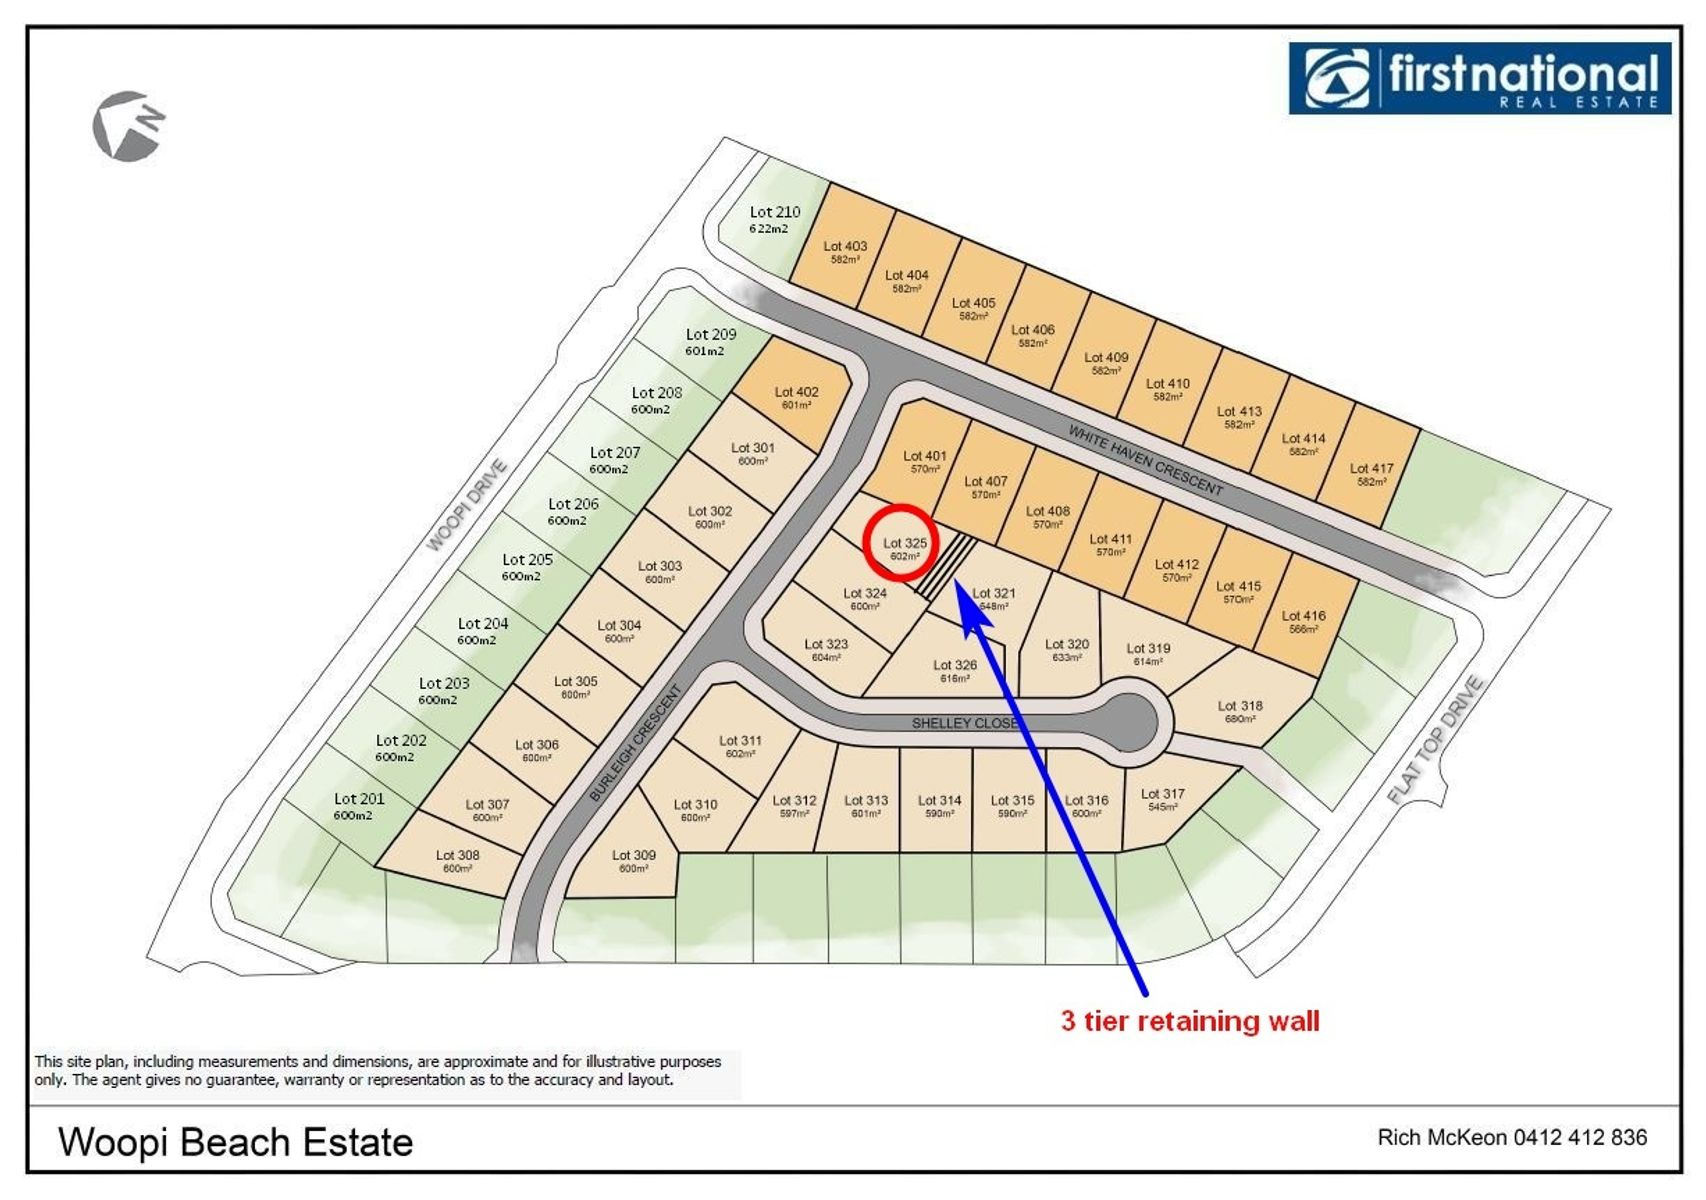 Lot 325 Burleigh Crescent, Woolgoolga, NSW 2456